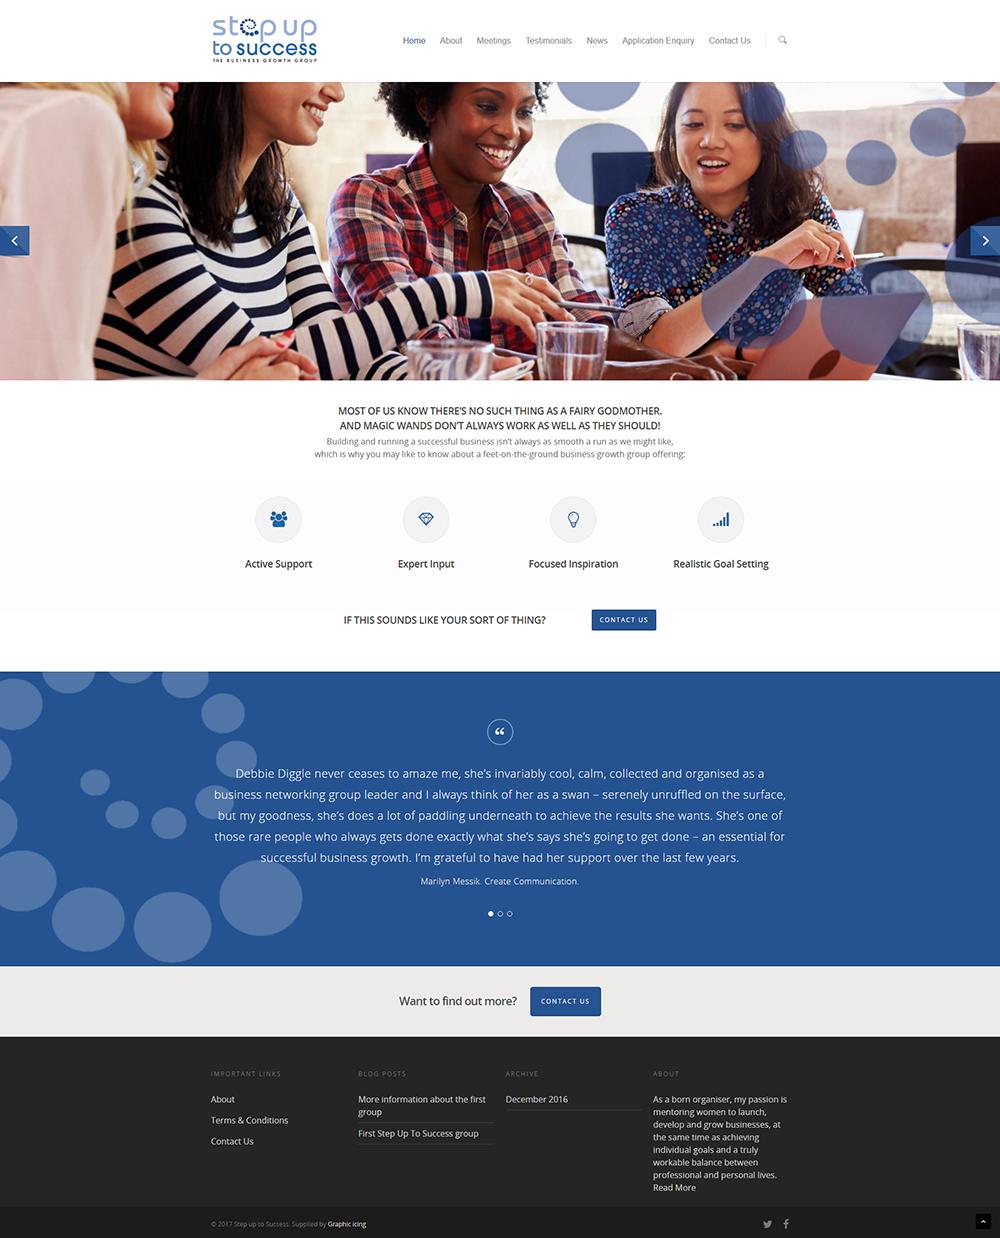 Step up to success website design